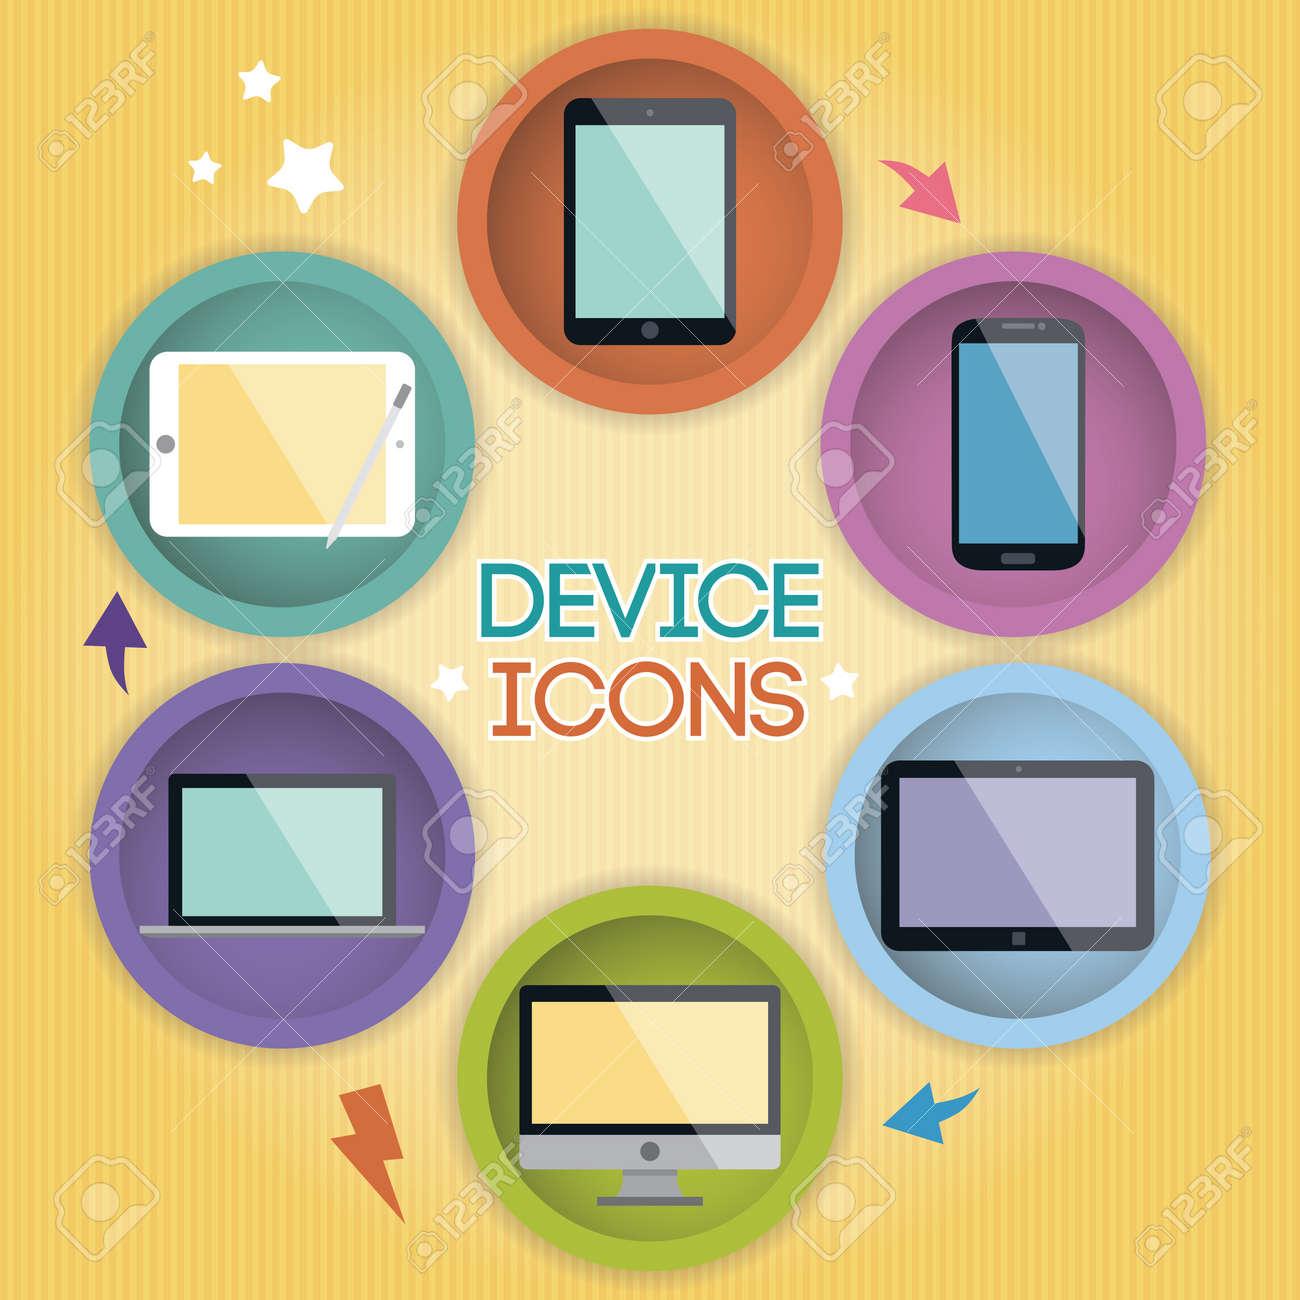 Cartoon Device Icons Stock Vector - 20955410